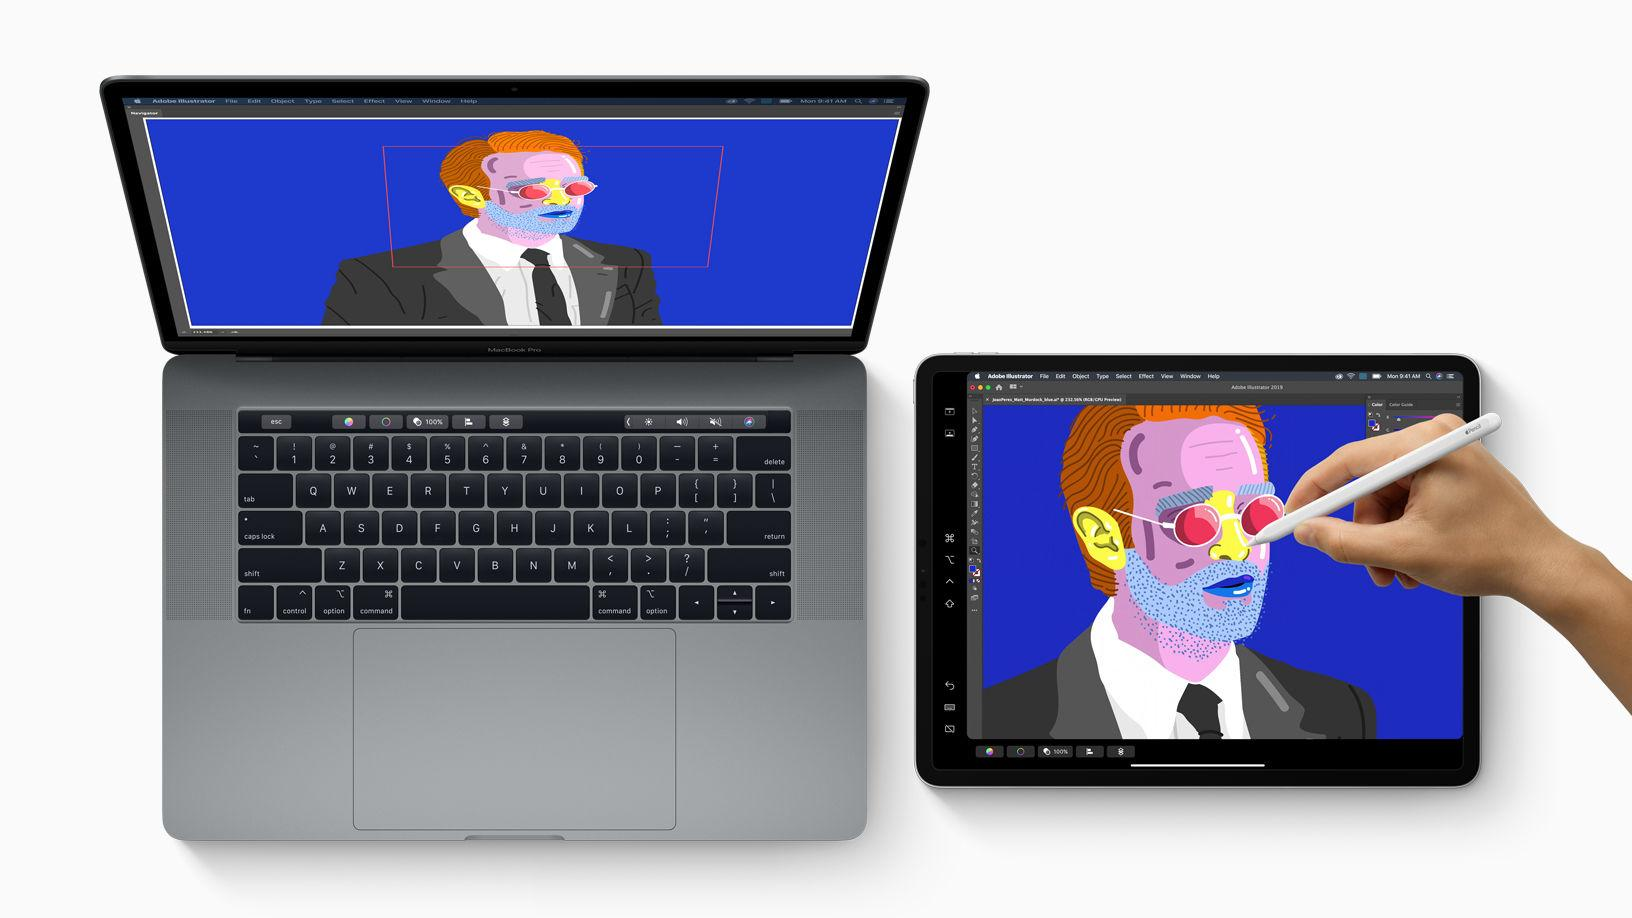 iPad as Mac screen